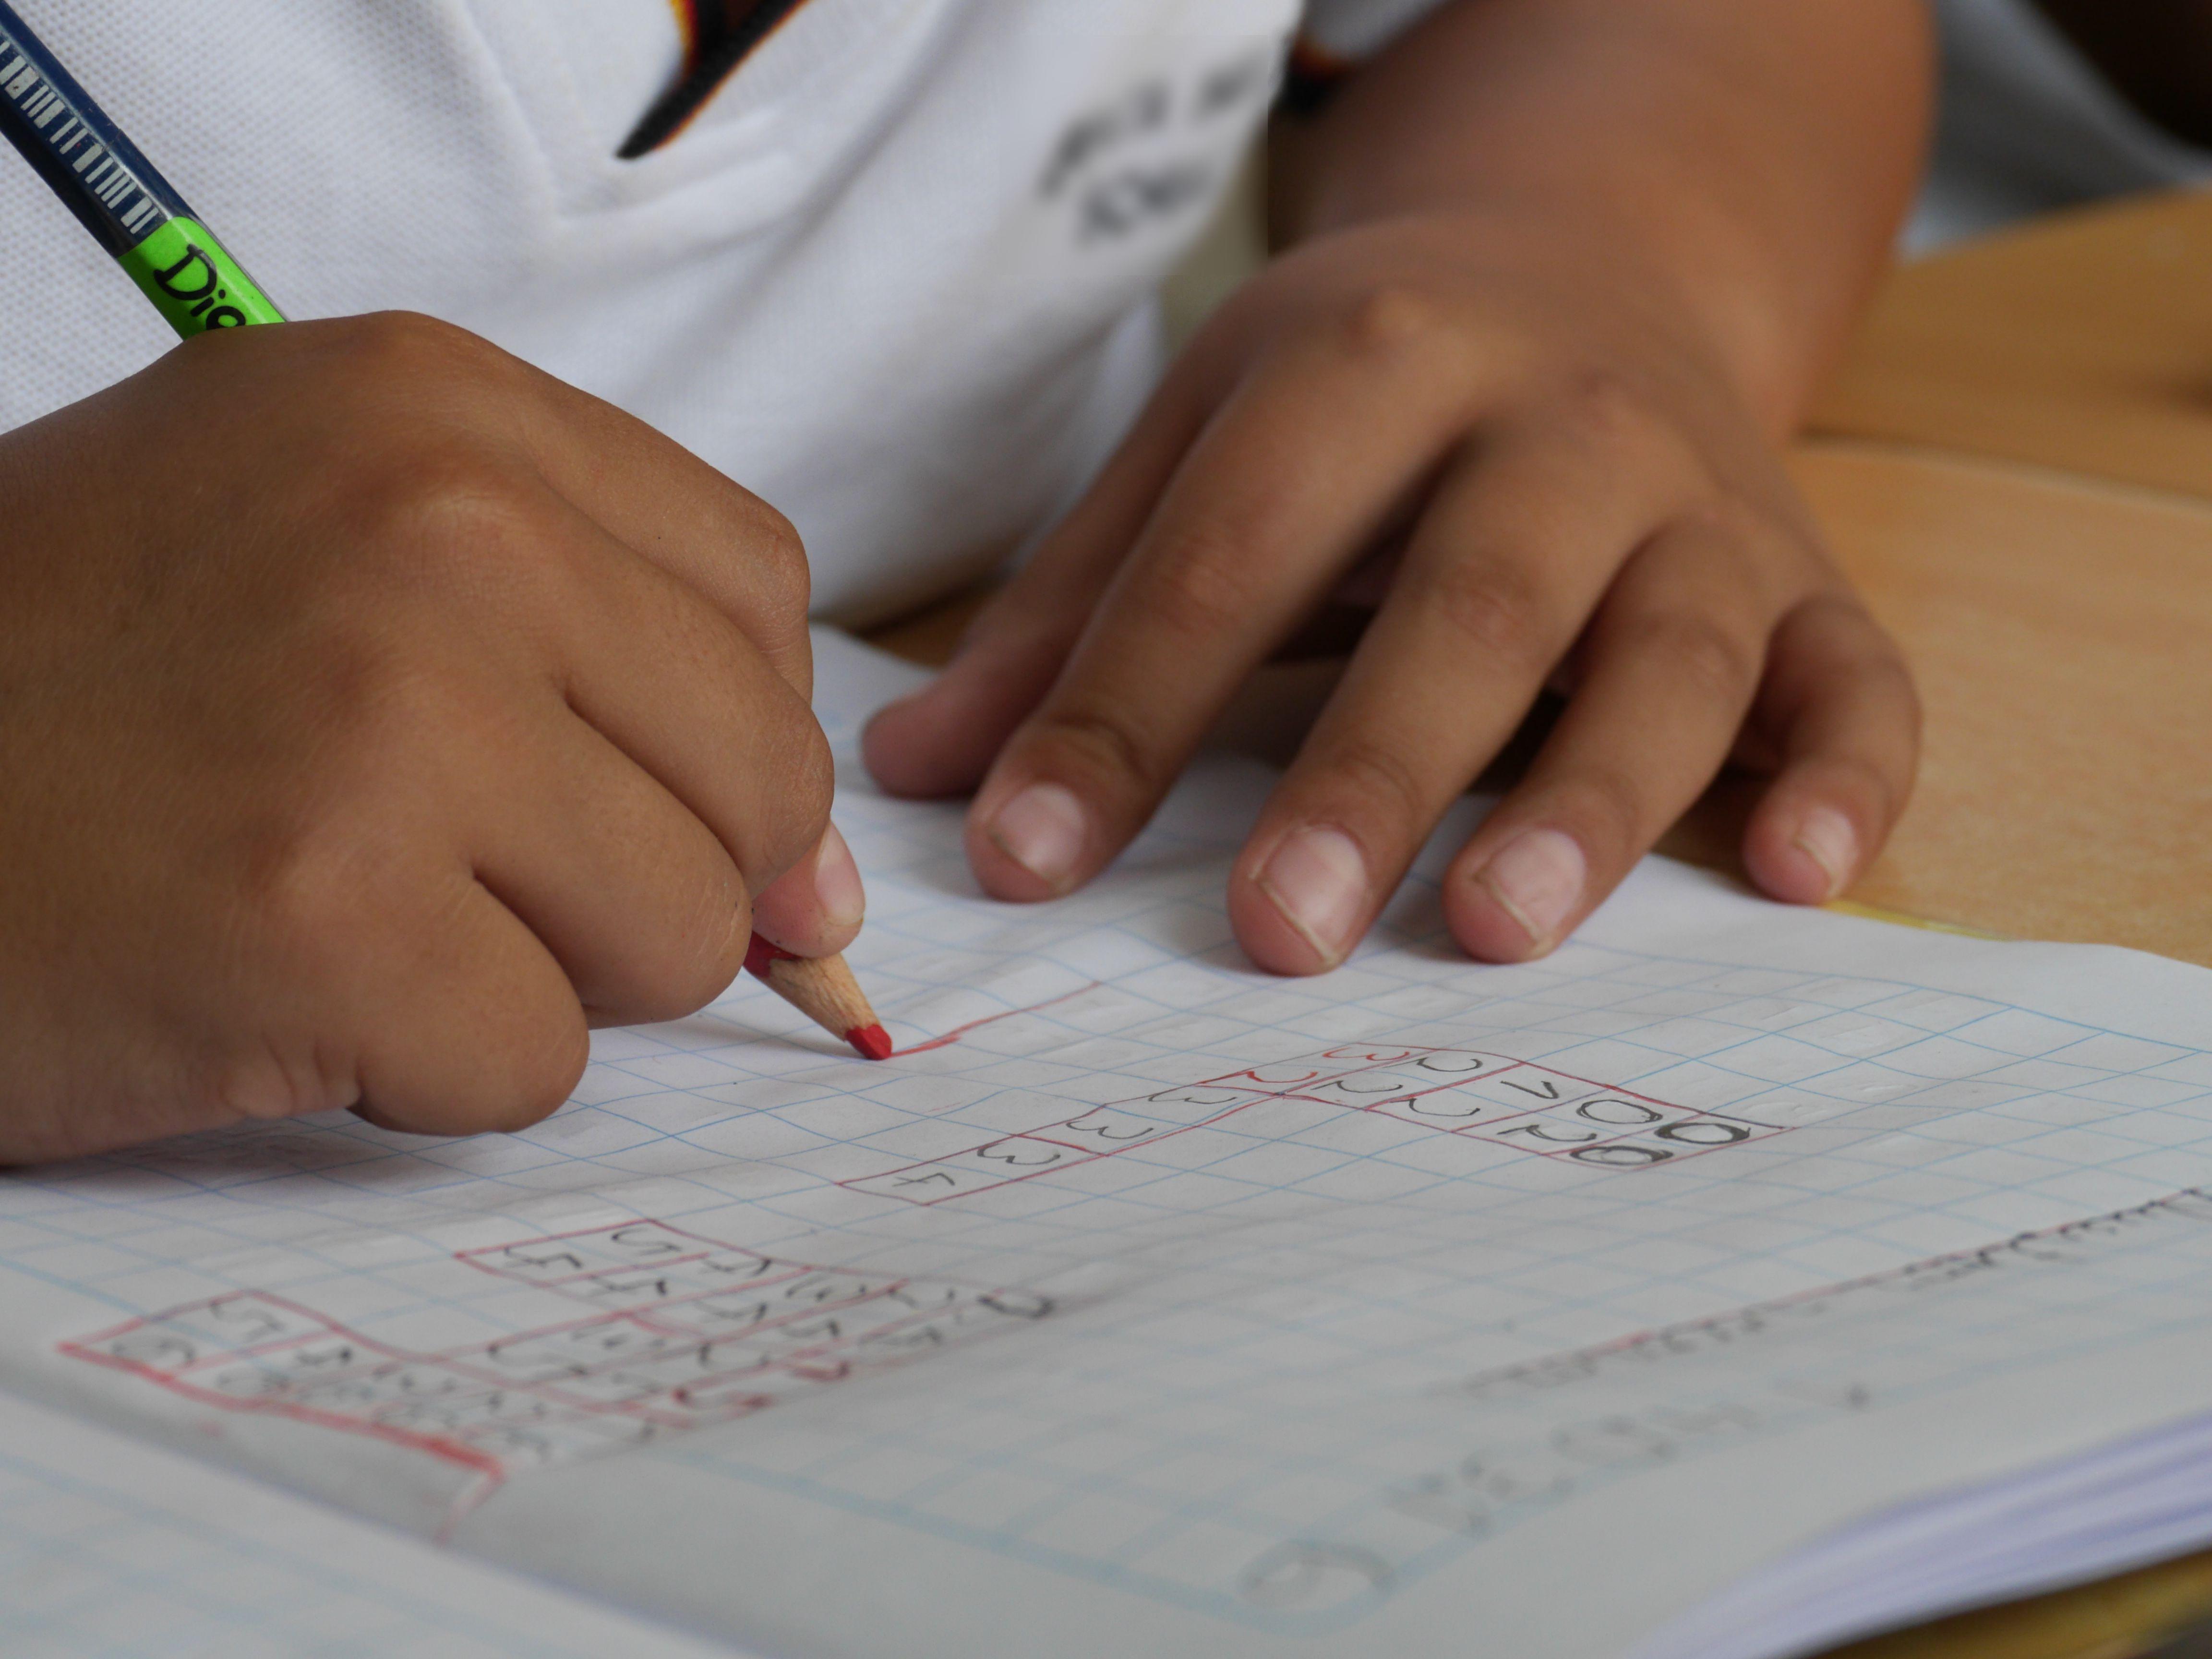 child-writing-pencil